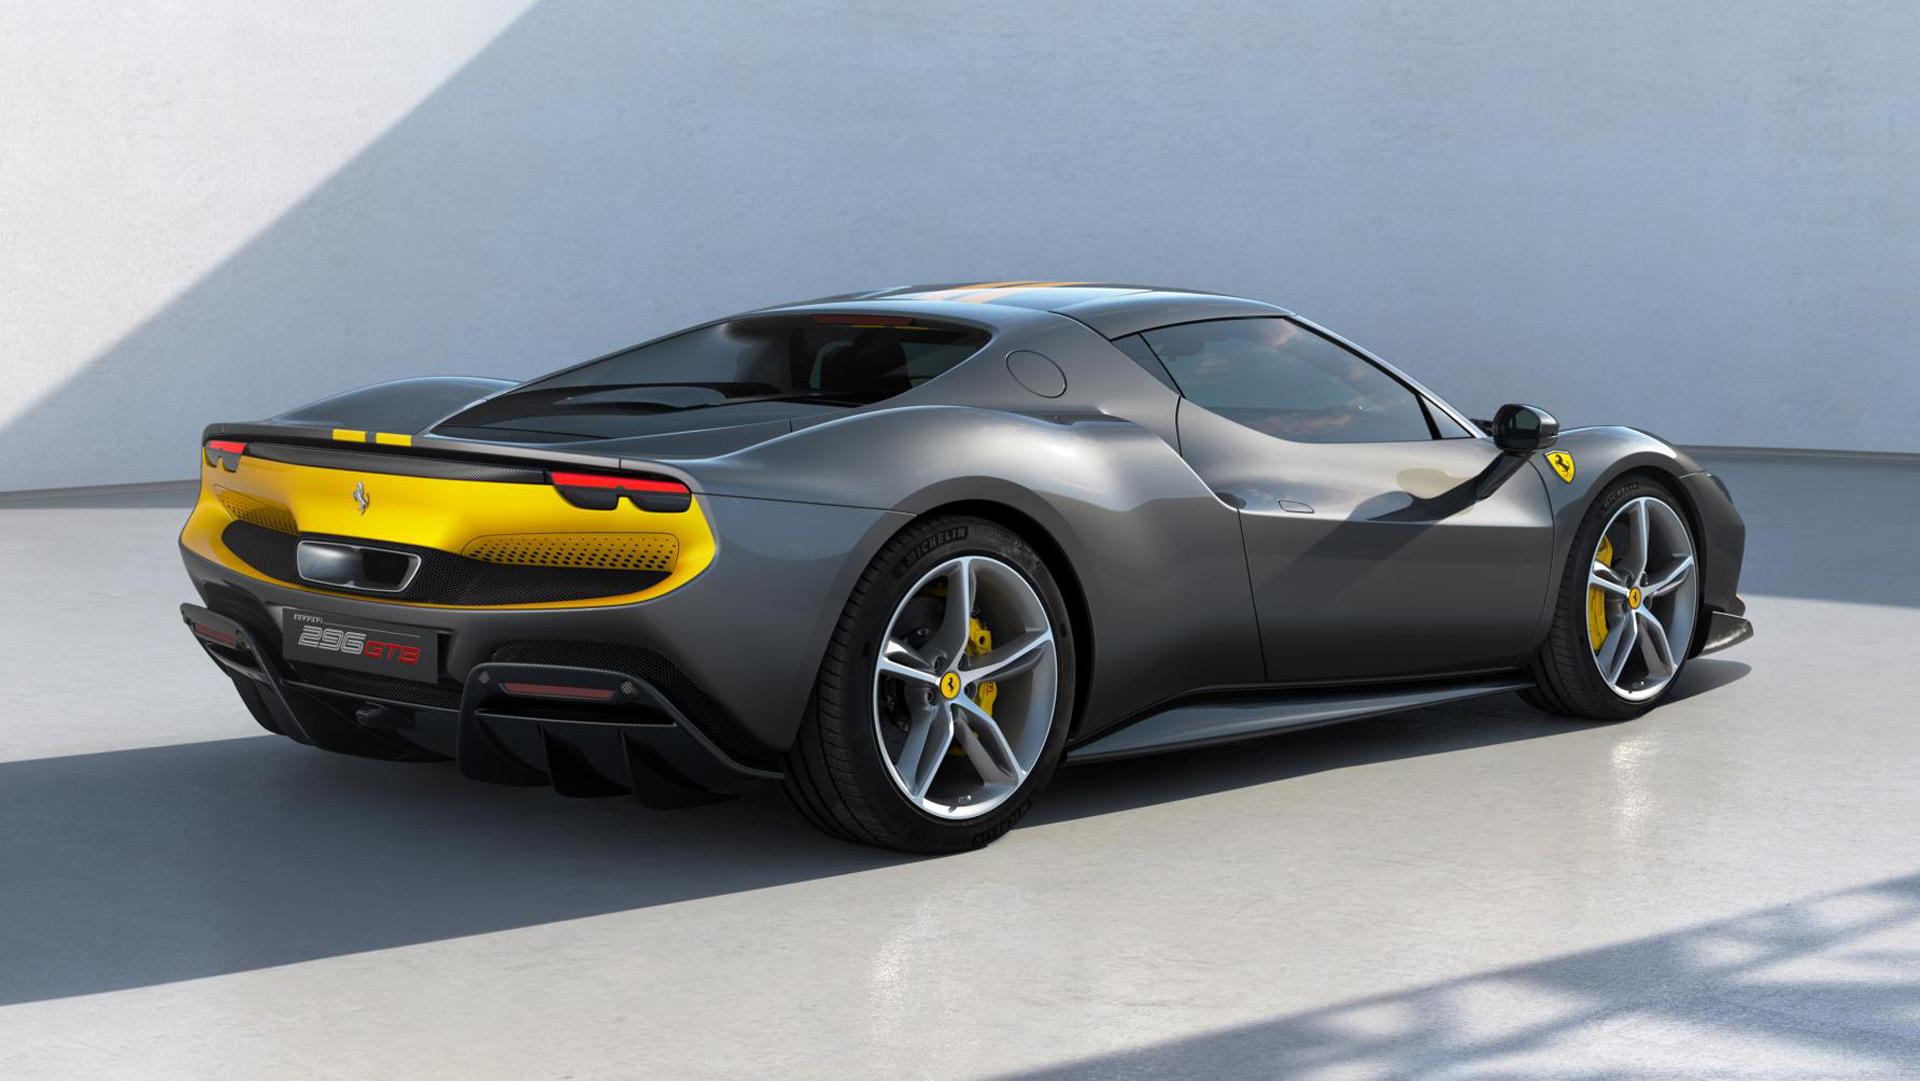 Ferrari 296 GTB, 2021 Techart GT Street R, 2024 VW ID Buzz: Today's Car News